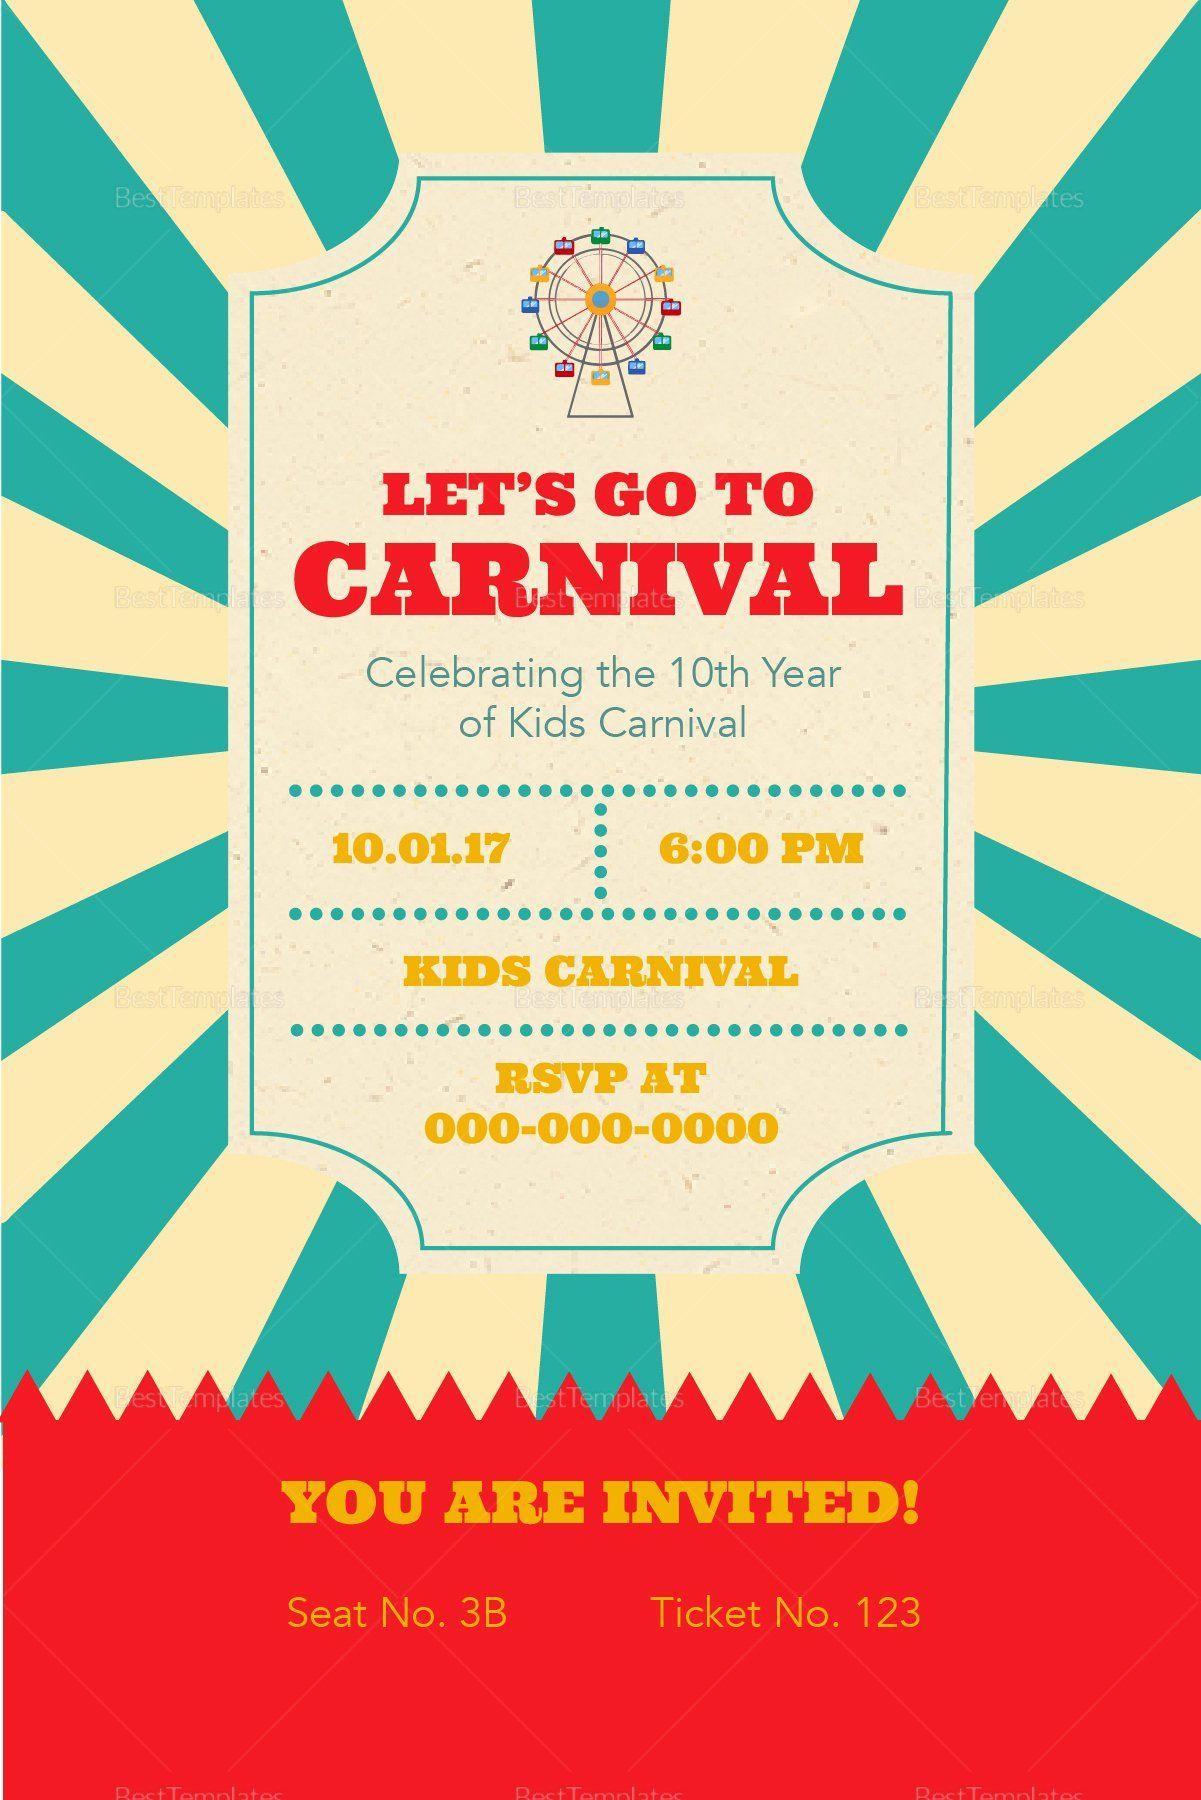 Carnival Ticket Invitation Template from i.pinimg.com